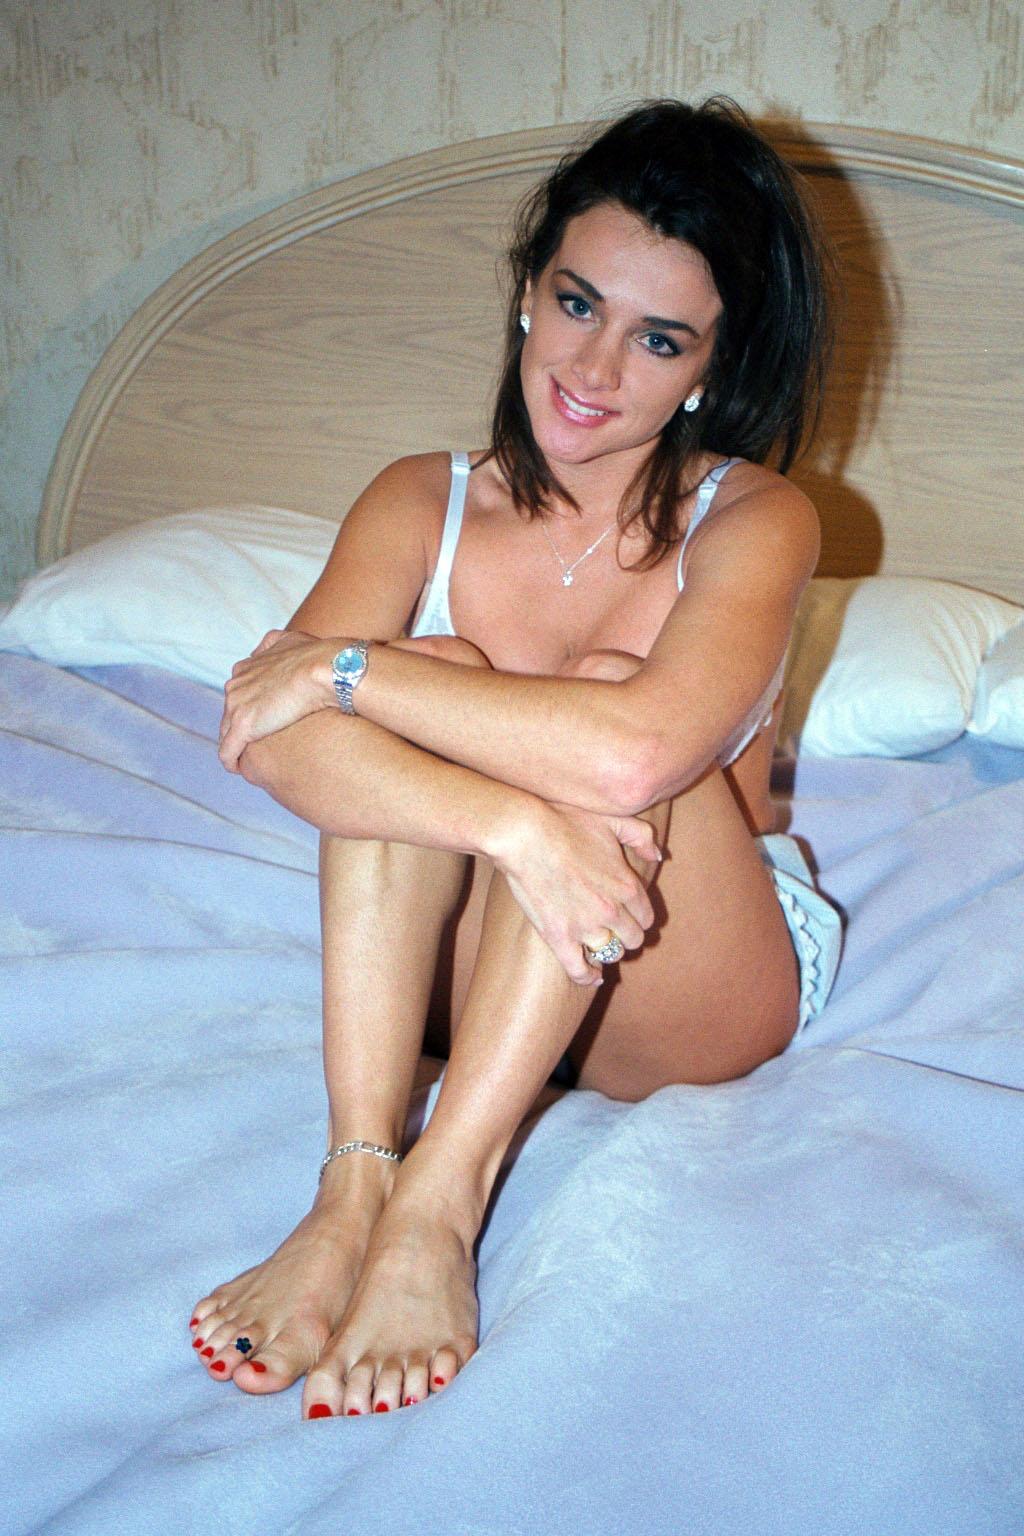 Anal mujeres sumisa acompanante greco sexo